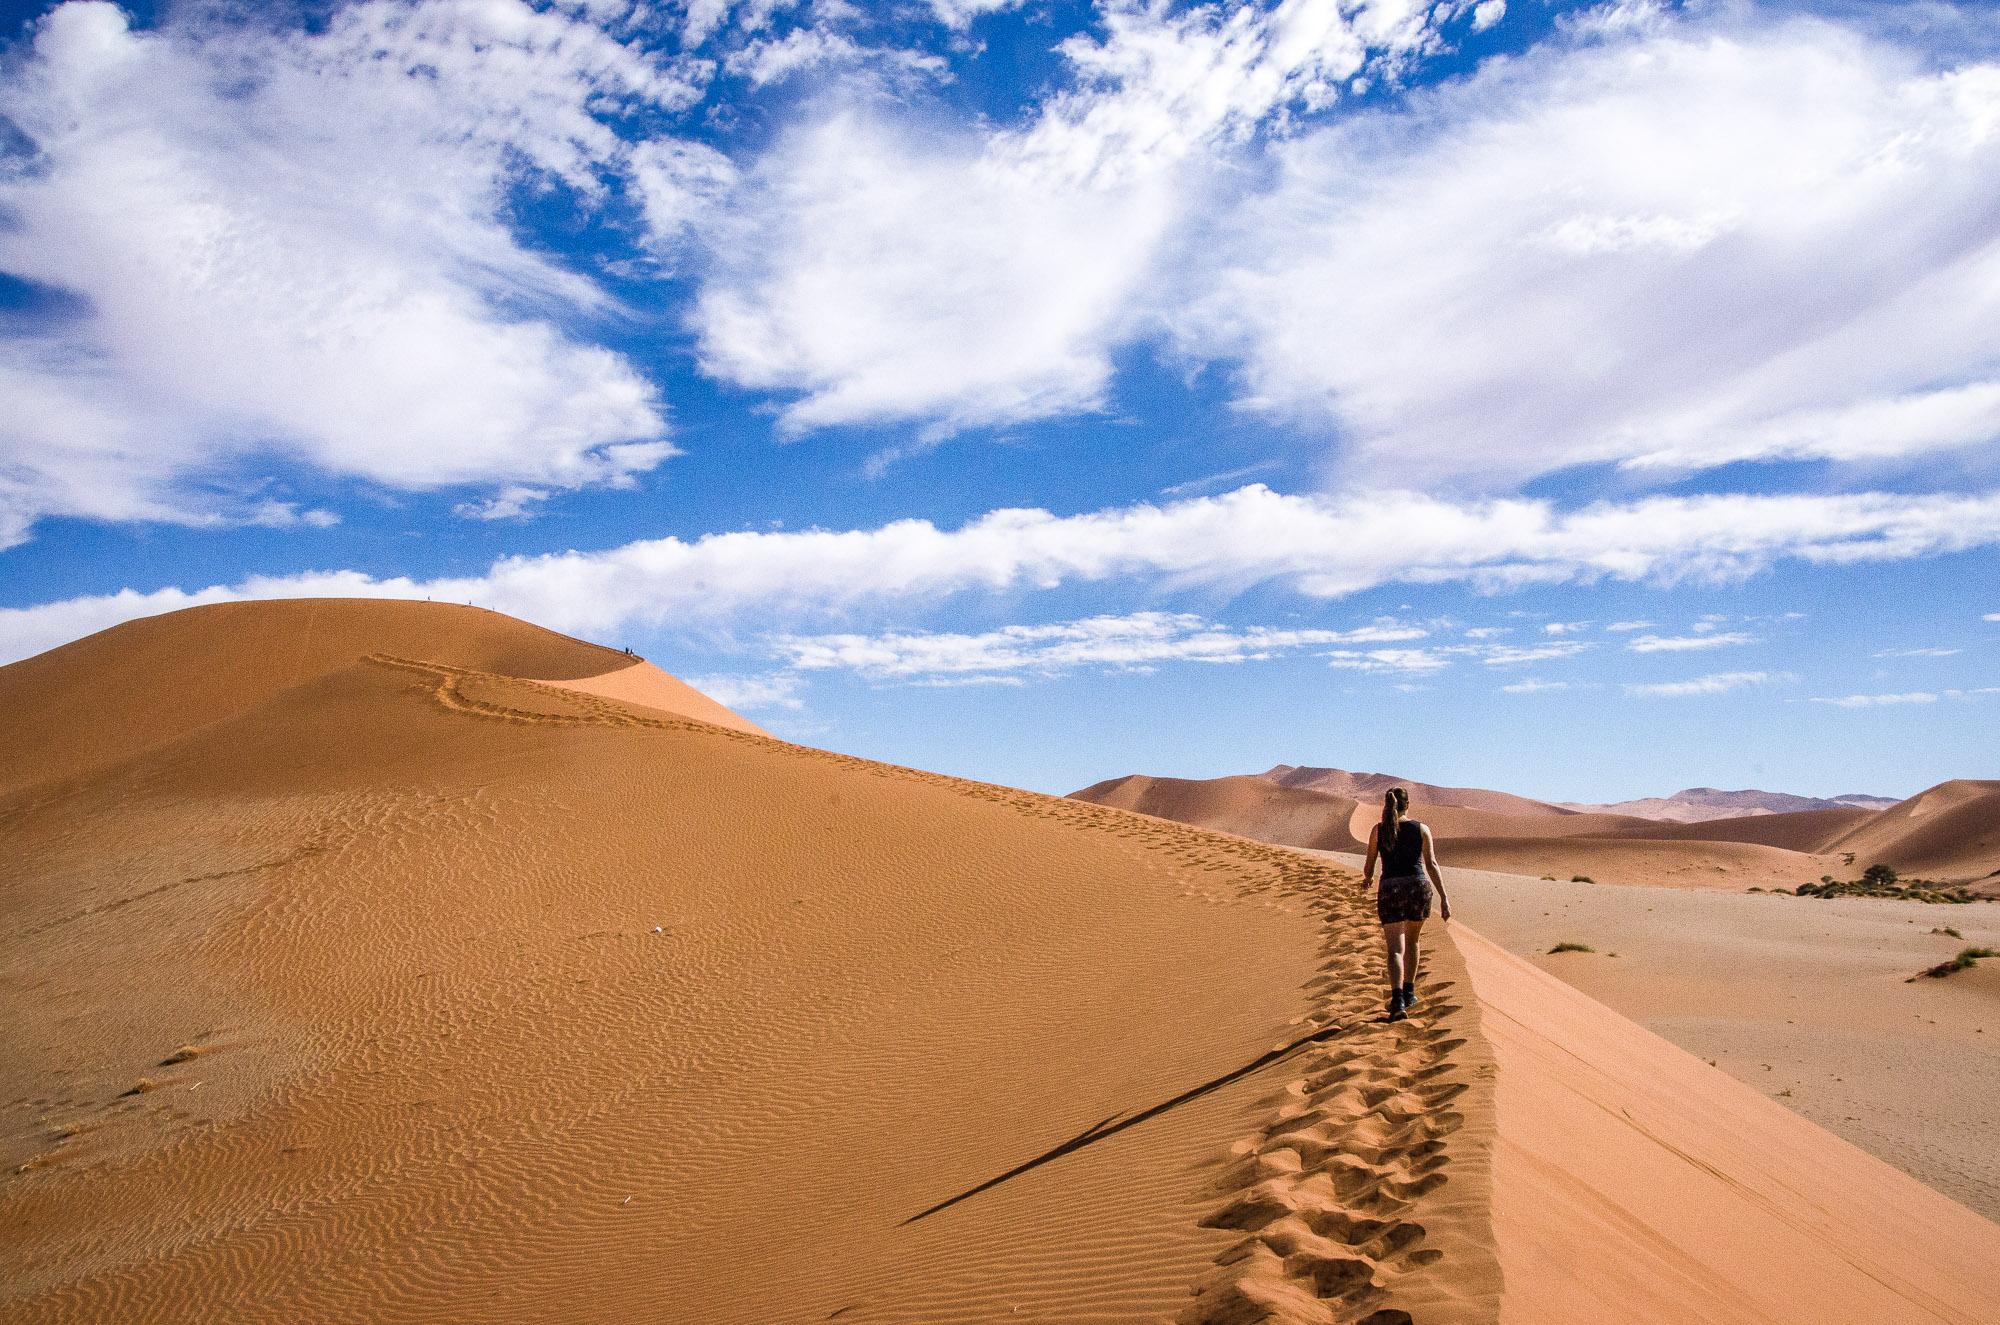 dune randonne escalader - sossuvlei - le desert du namibie - afrique, namibie